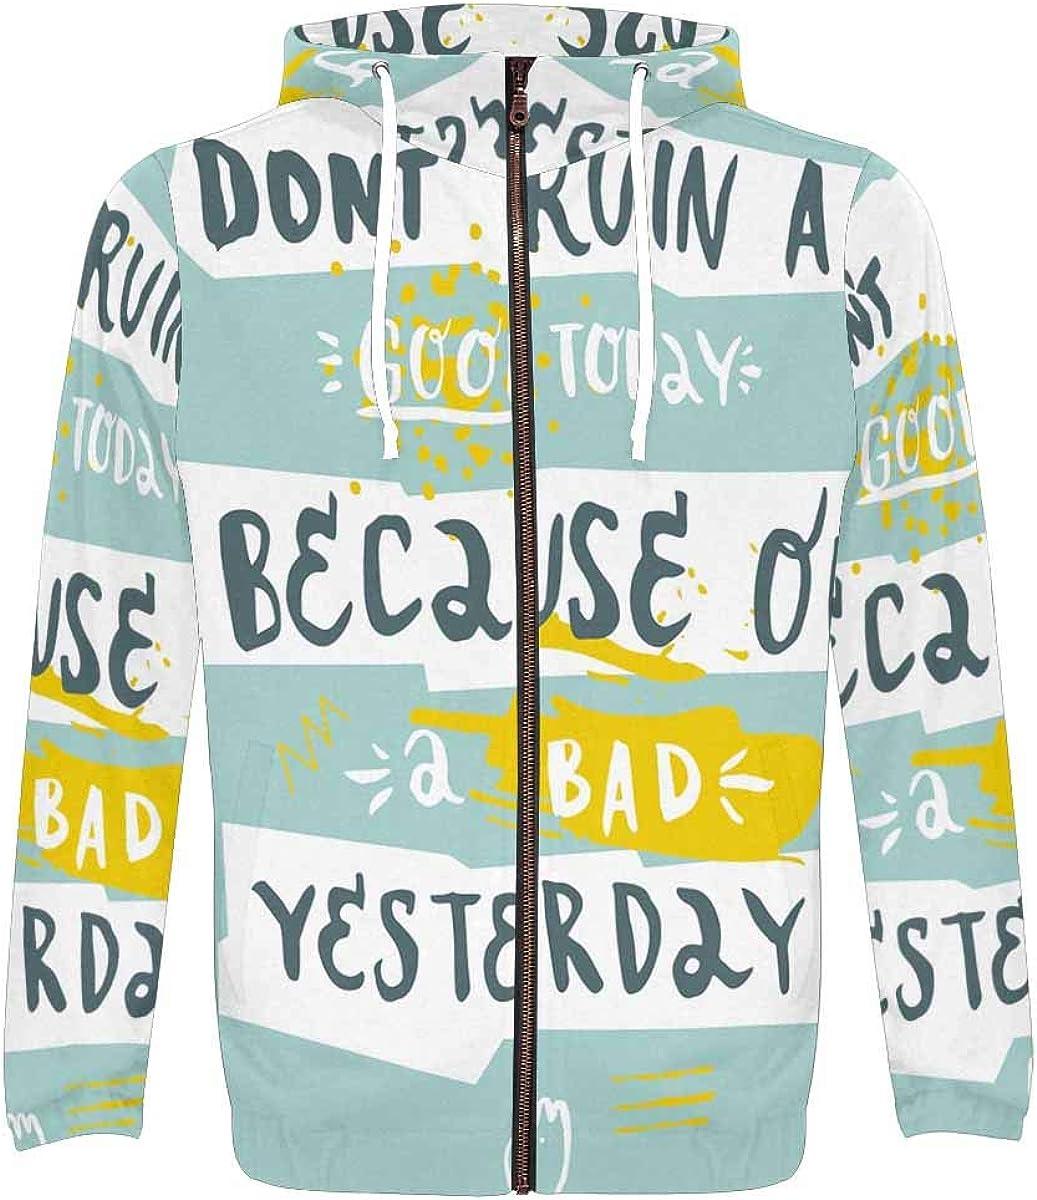 InterestPrint Men's Pullover Full Zip 4 years Mail order cheap warranty Sweatshirt R Hoodies Don't